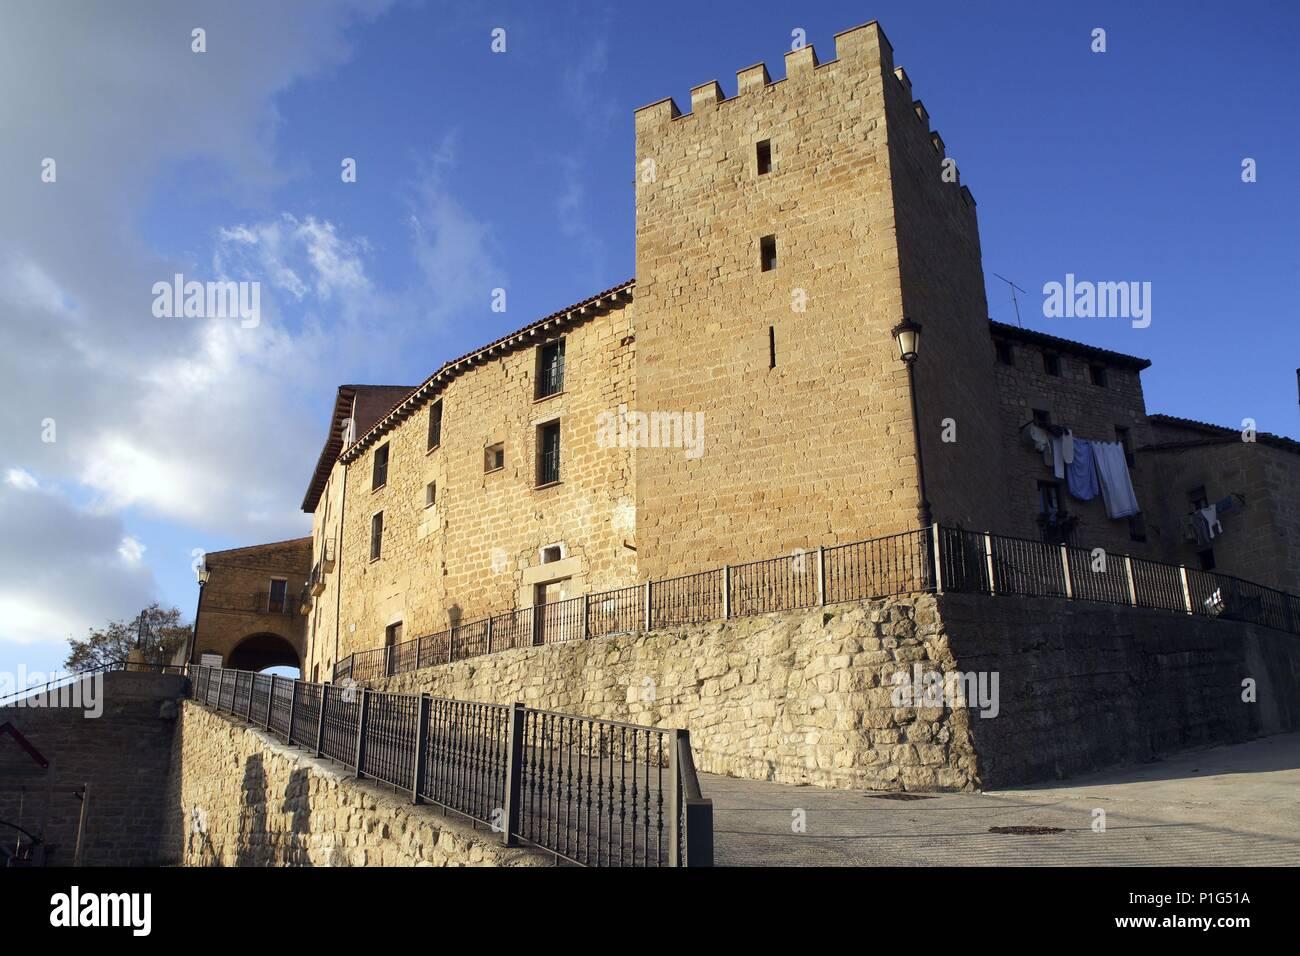 SPAIN - BASQUE COUNTRY - Rioja alavesa (district) - ALAVA. villa fortificada de Labraza. - Stock Image